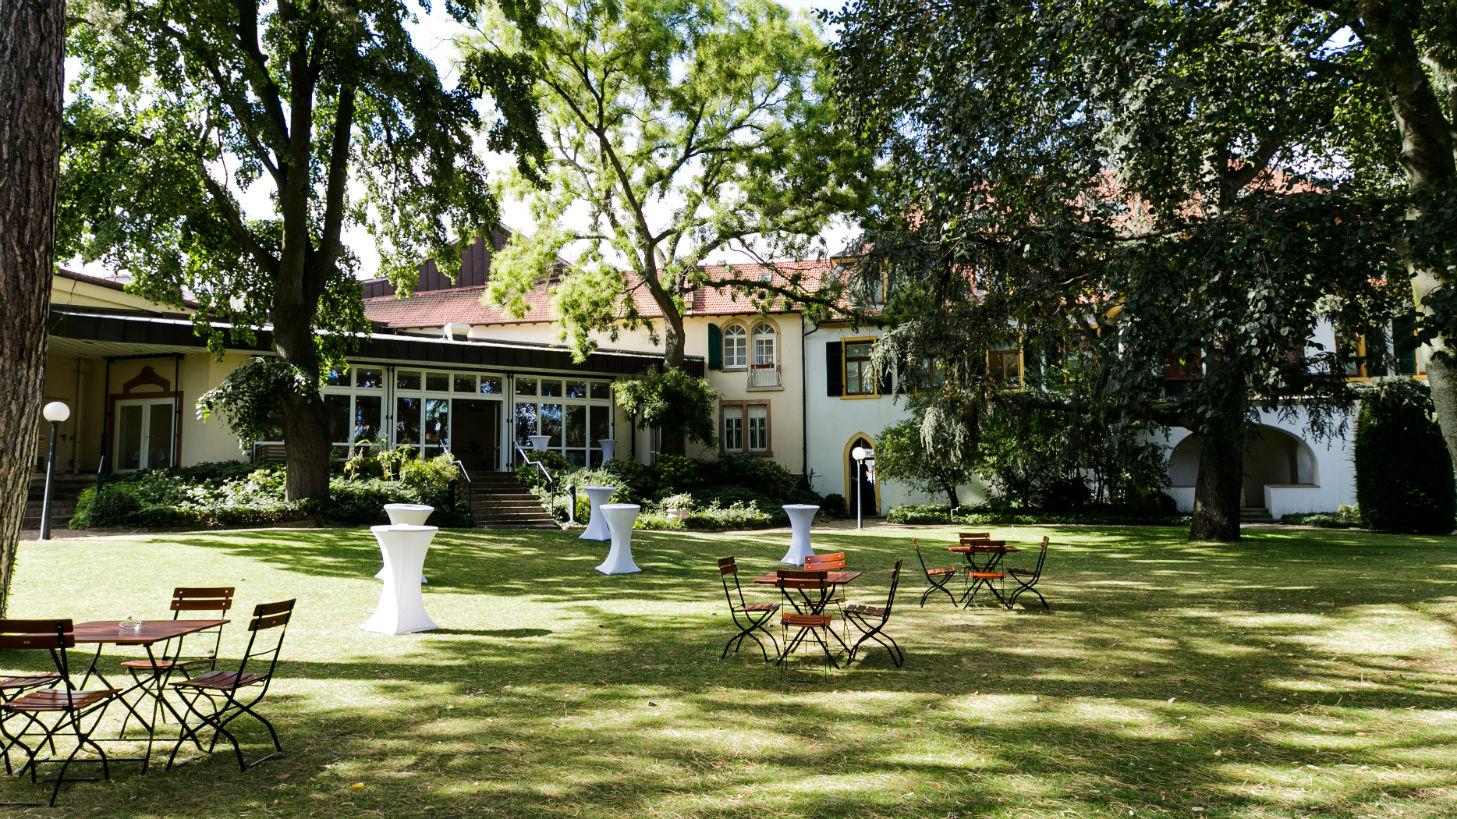 Der idyllische Schlossgarten der Sektkellerei Schloss Wachenheim